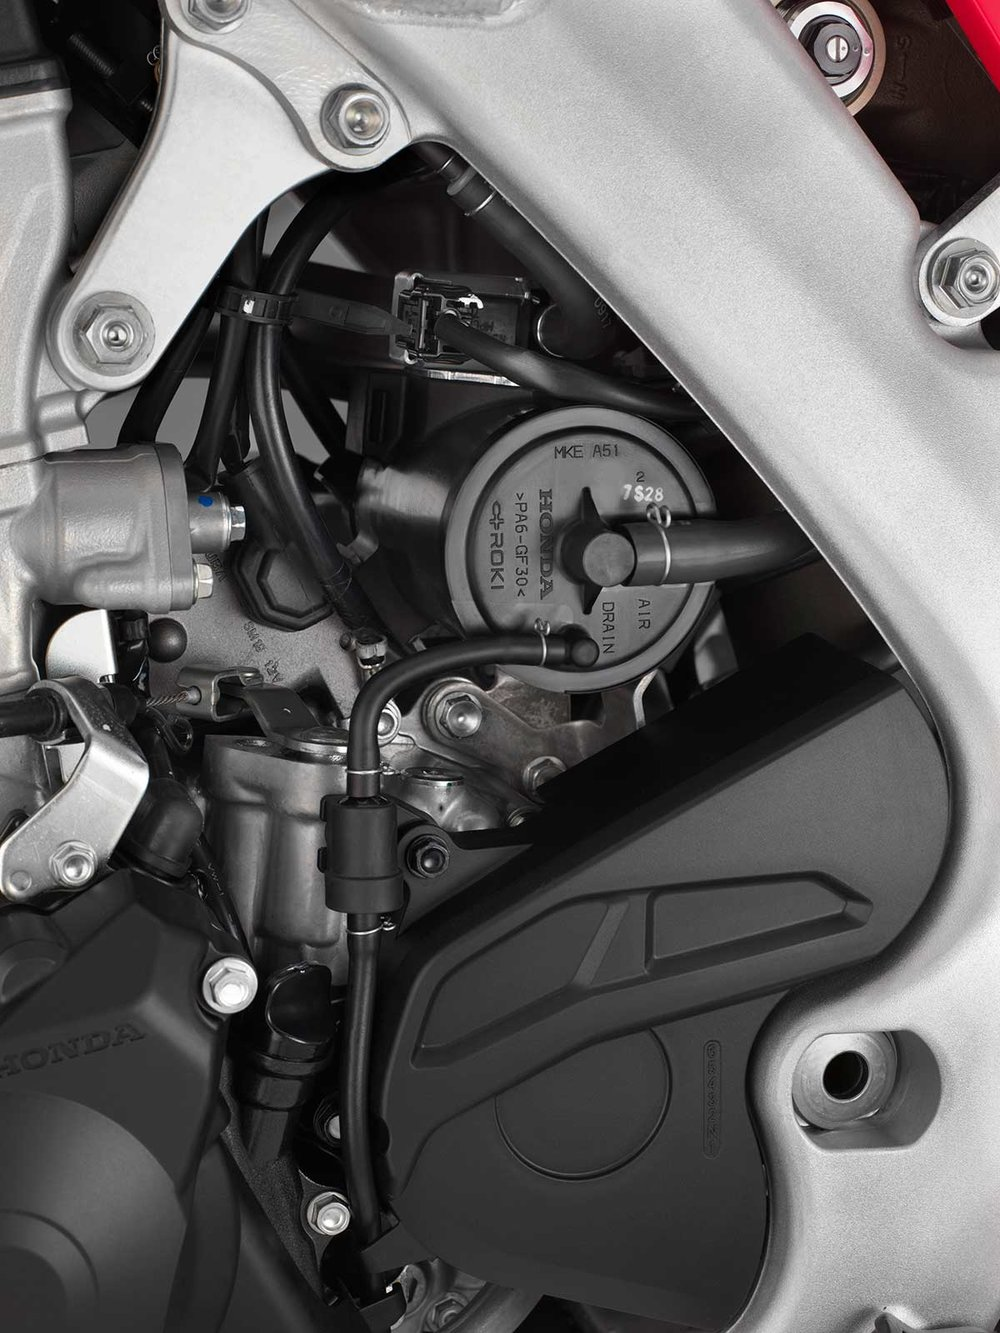 19-Honda-CRF450X_canister.jpg